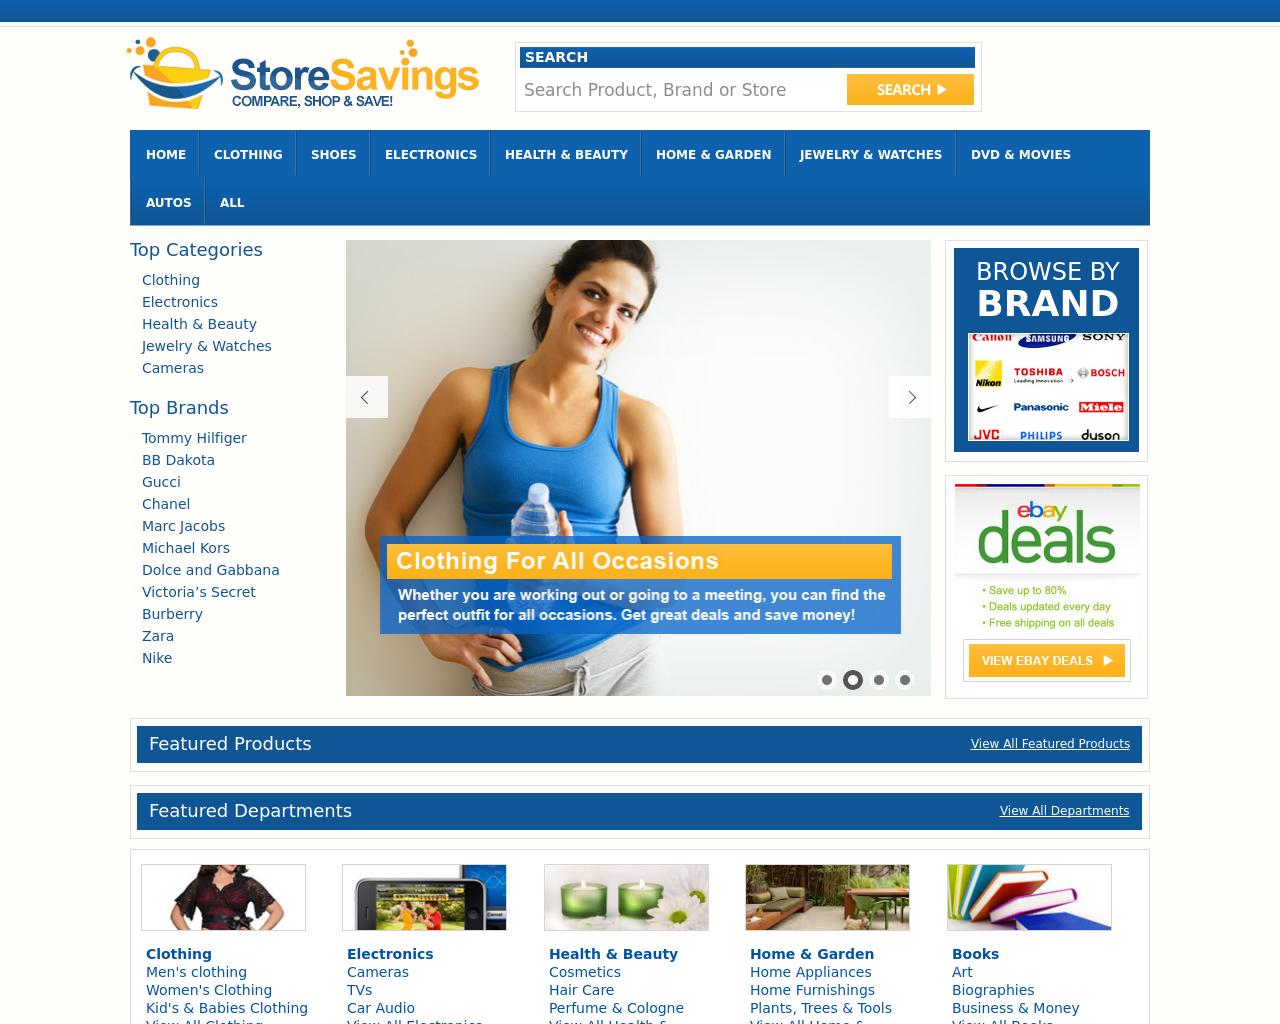 StoreSavings-Advertising-Reviews-Pricing